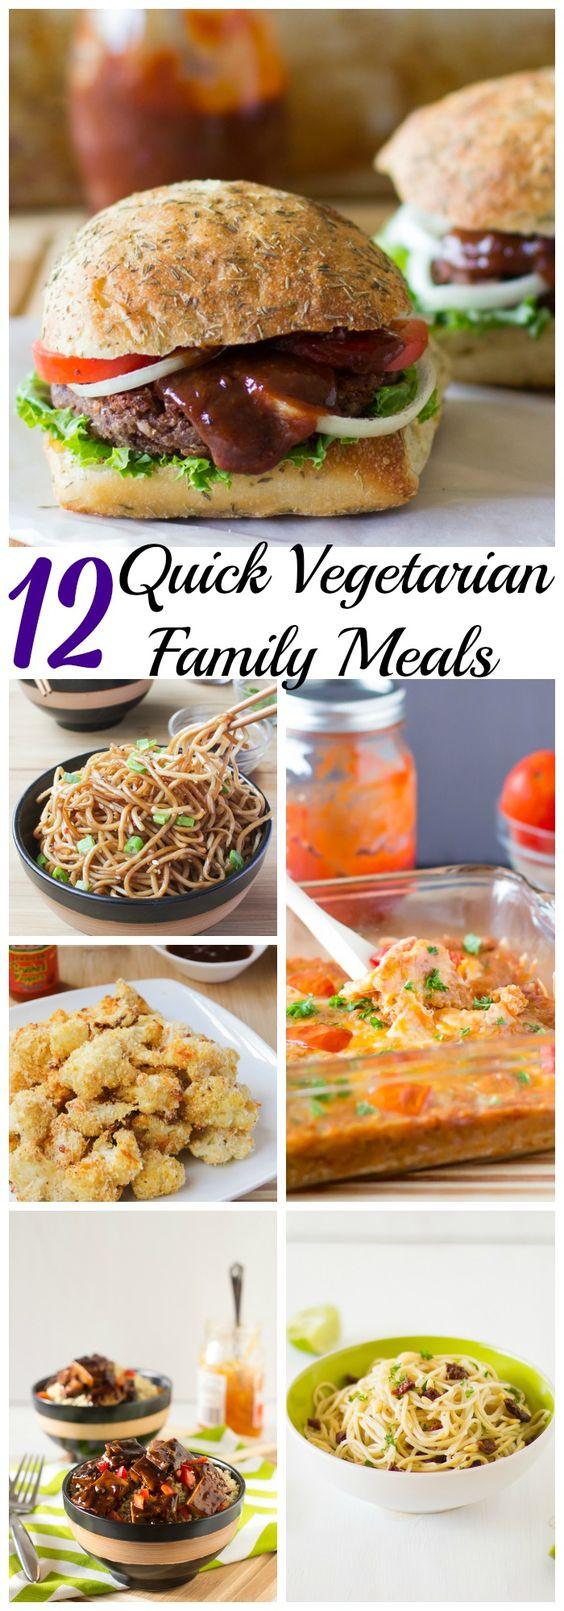 Easy Vegetarian Dinner Recipes For Family  12 Quick Ve arian Family Meals